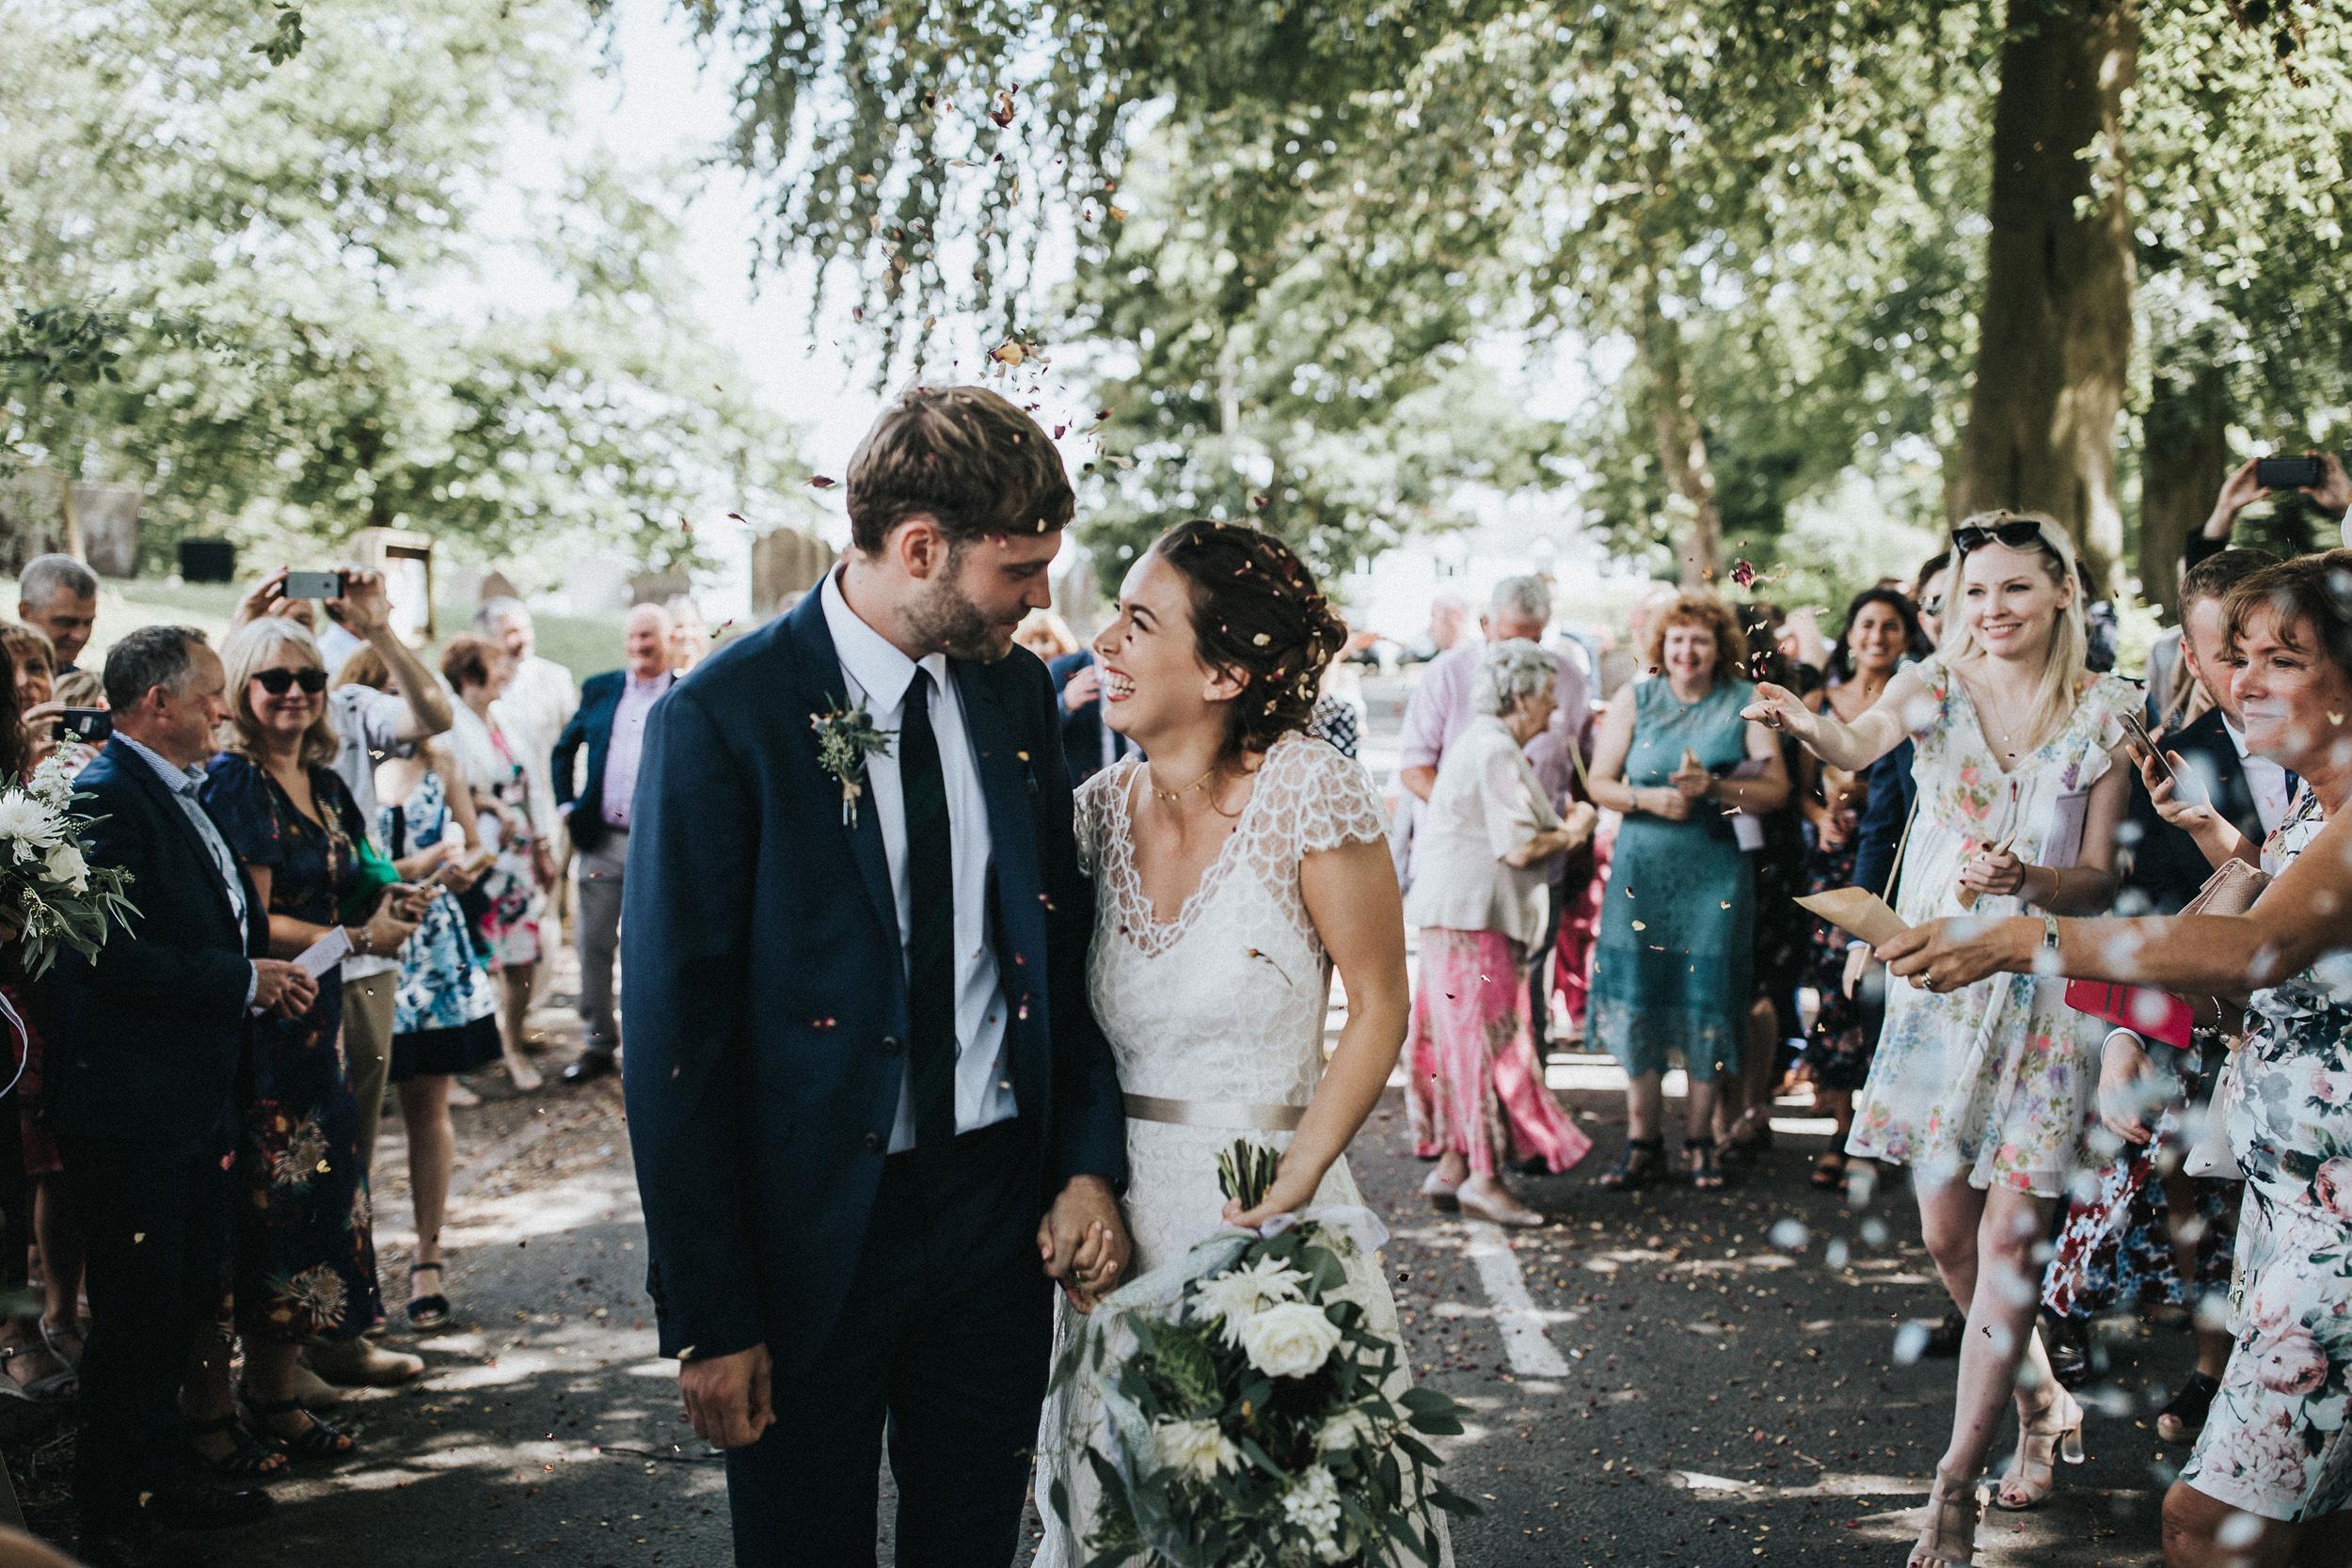 Martha-Laid-Back-Garden-Wedding-Lace-Wedding-Dress-Bohemian-Kate-Beaumont-25.jpg